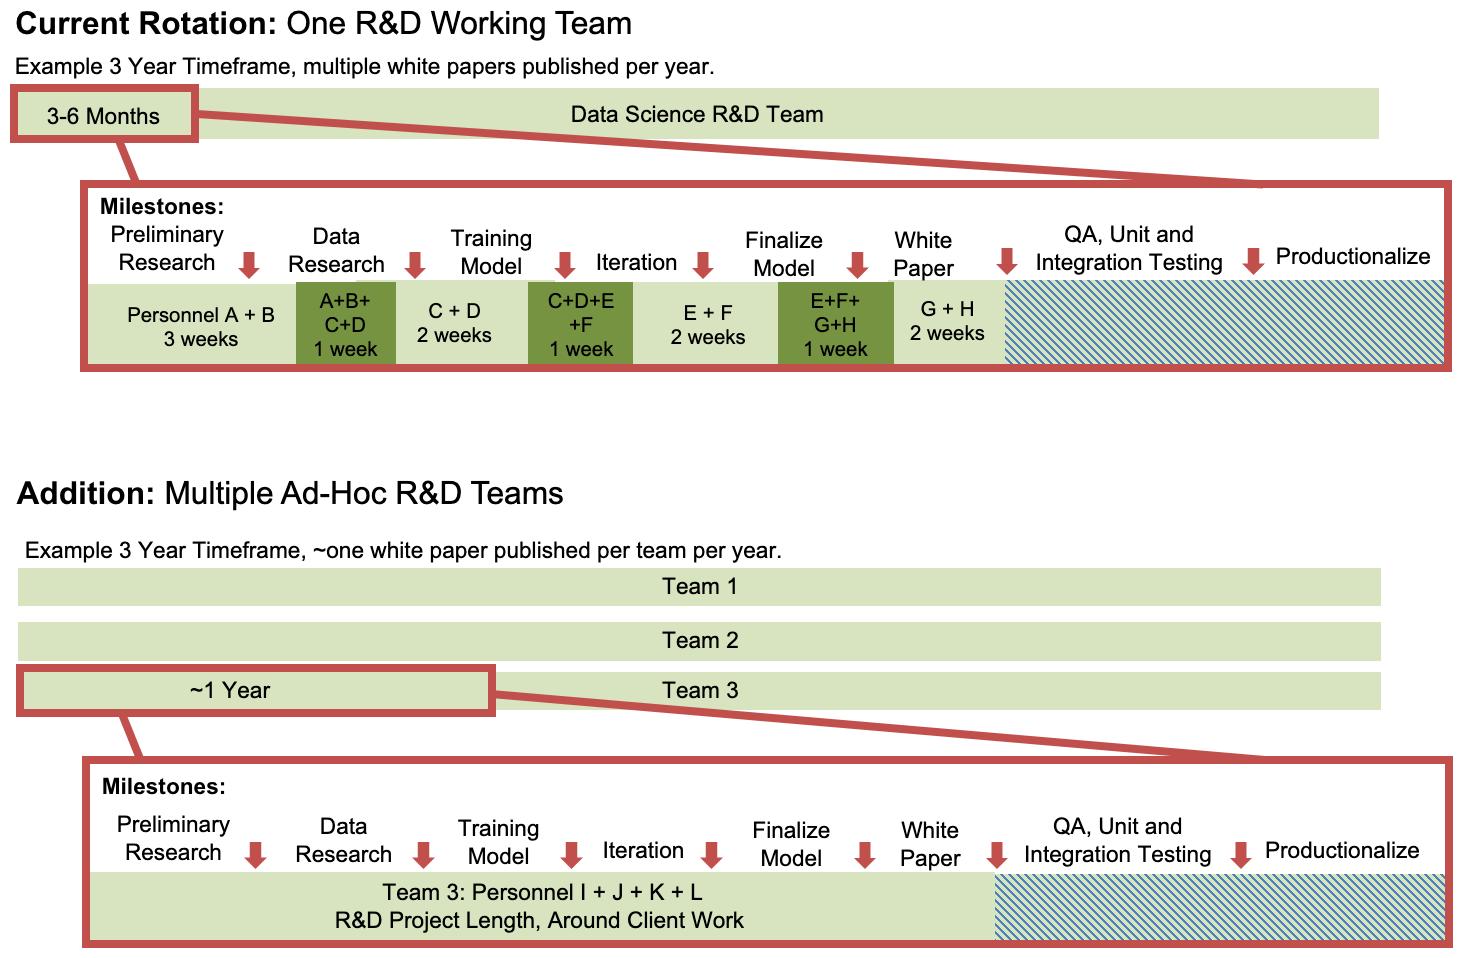 Ad-Hoc R&D Team Rotation